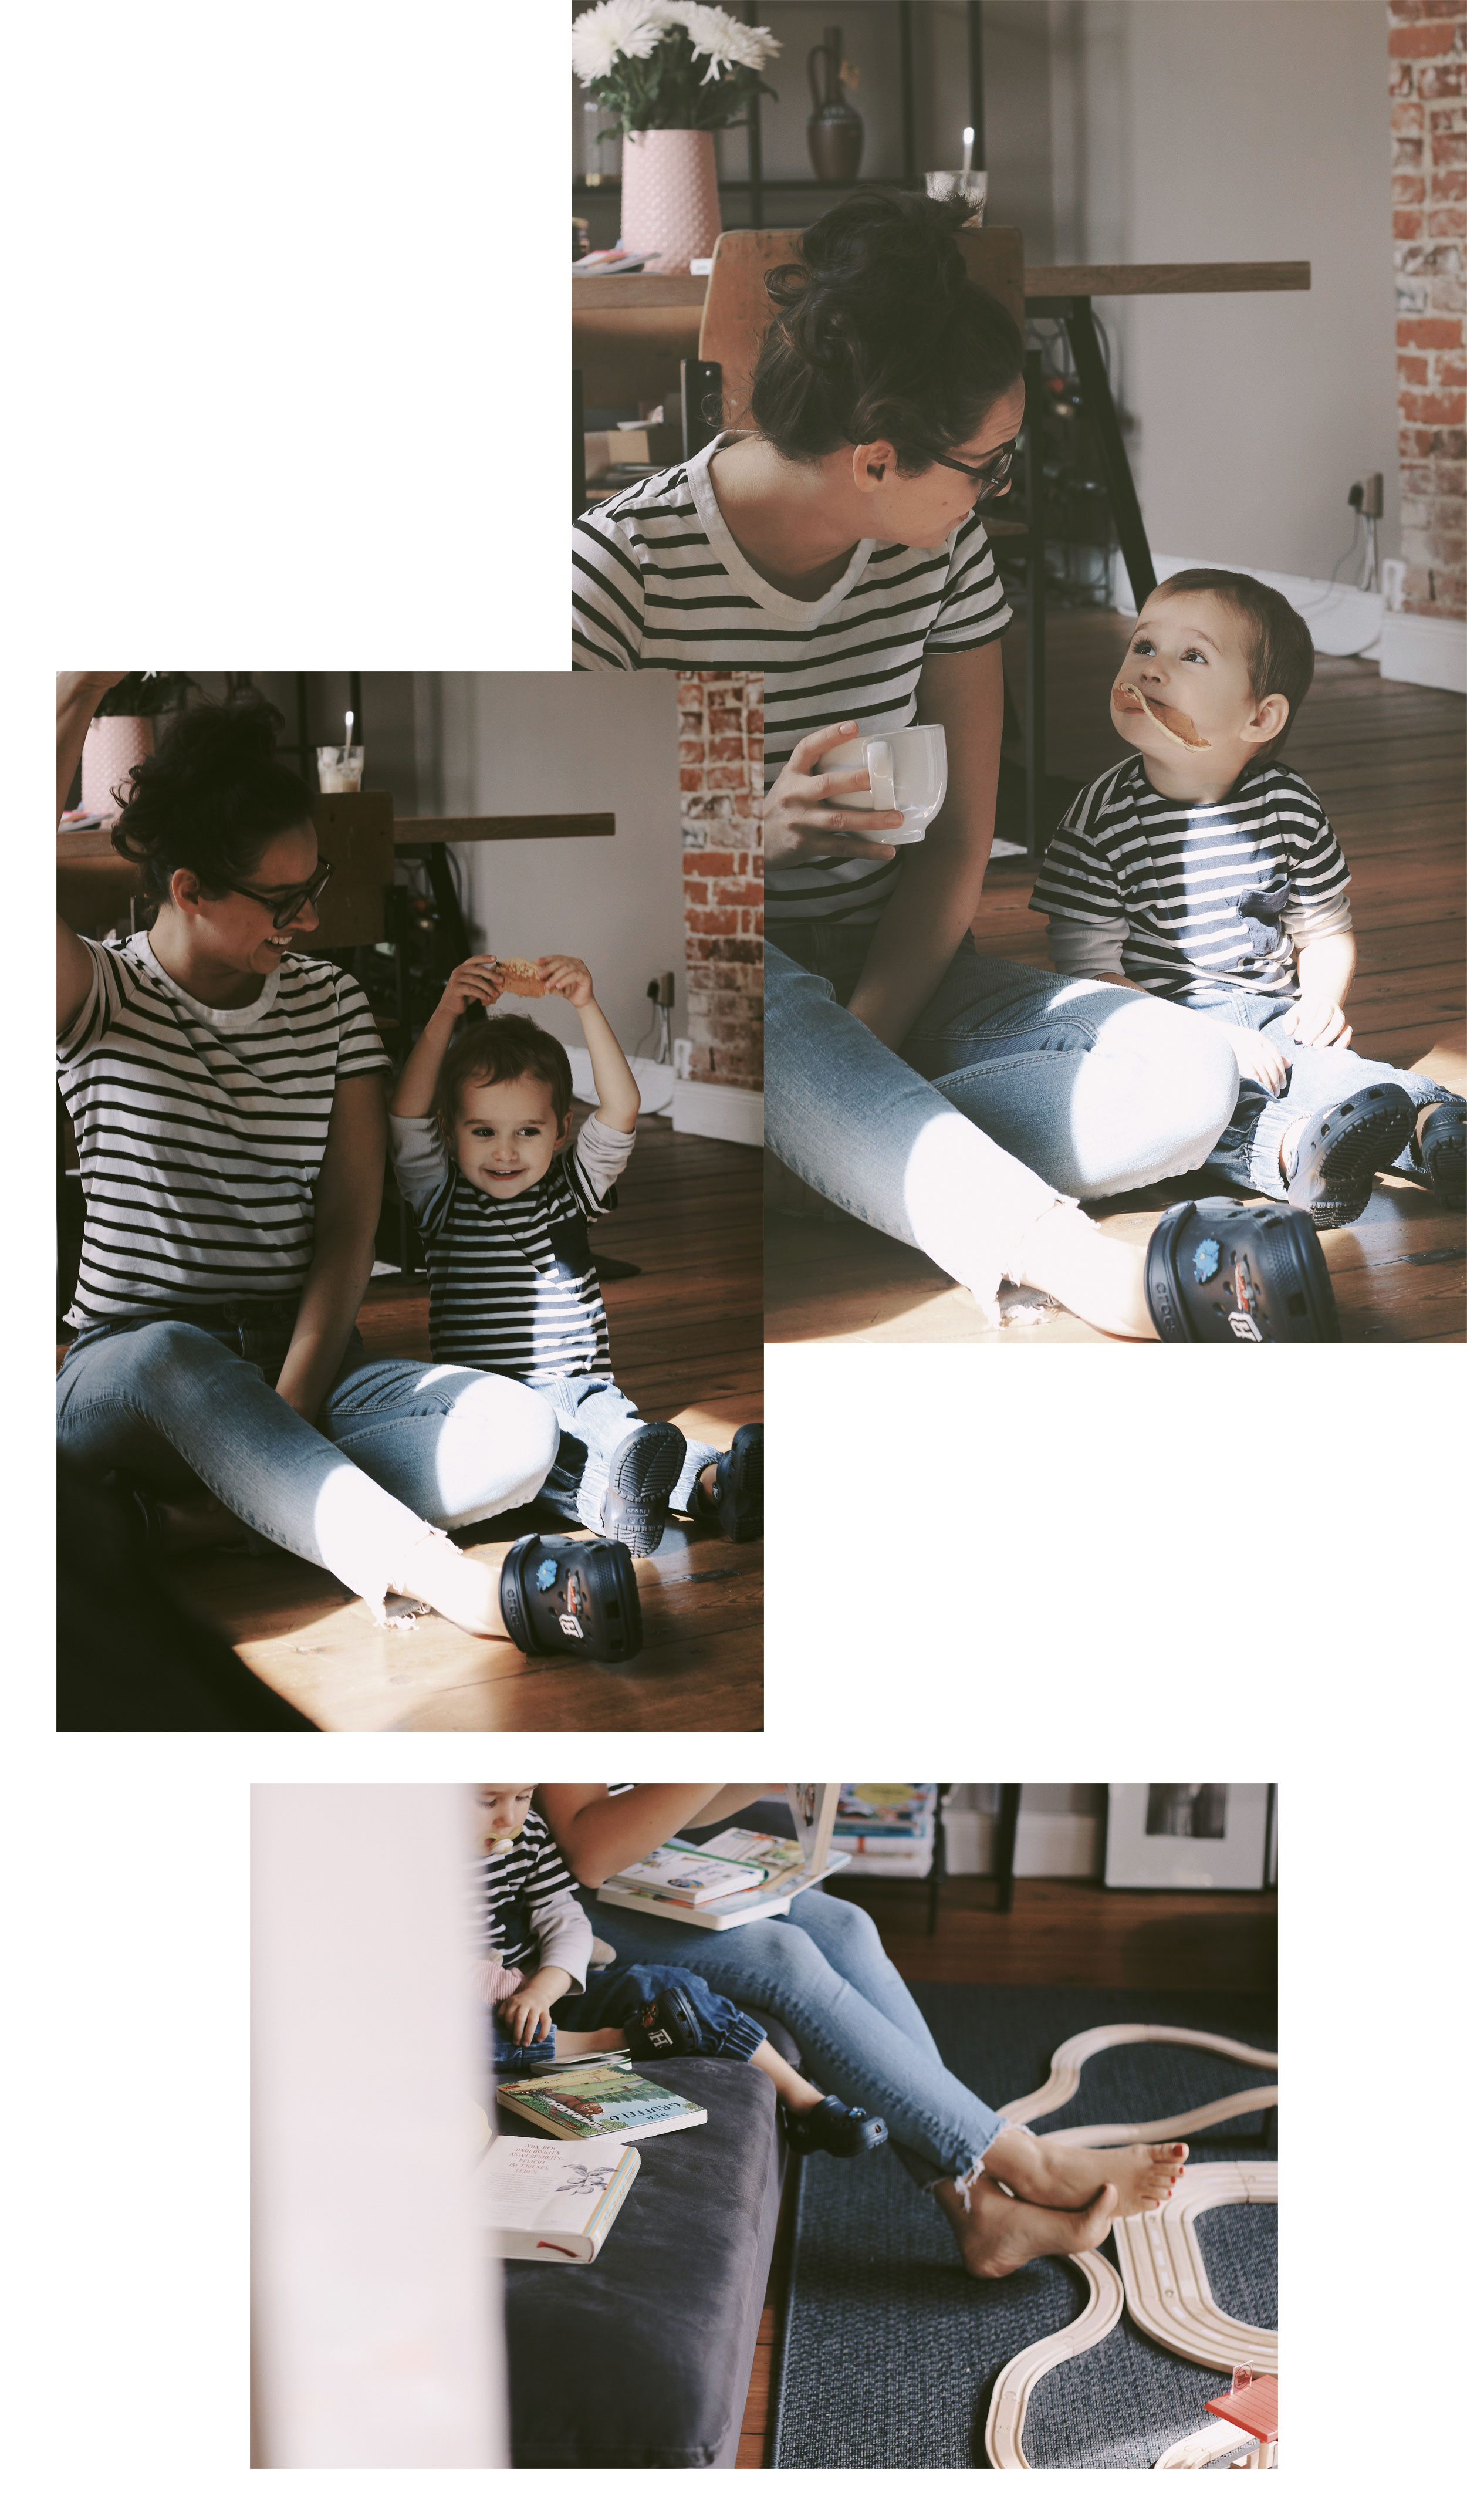 Alltagsroutinen mit Kind | Mamakolumne | Crocs